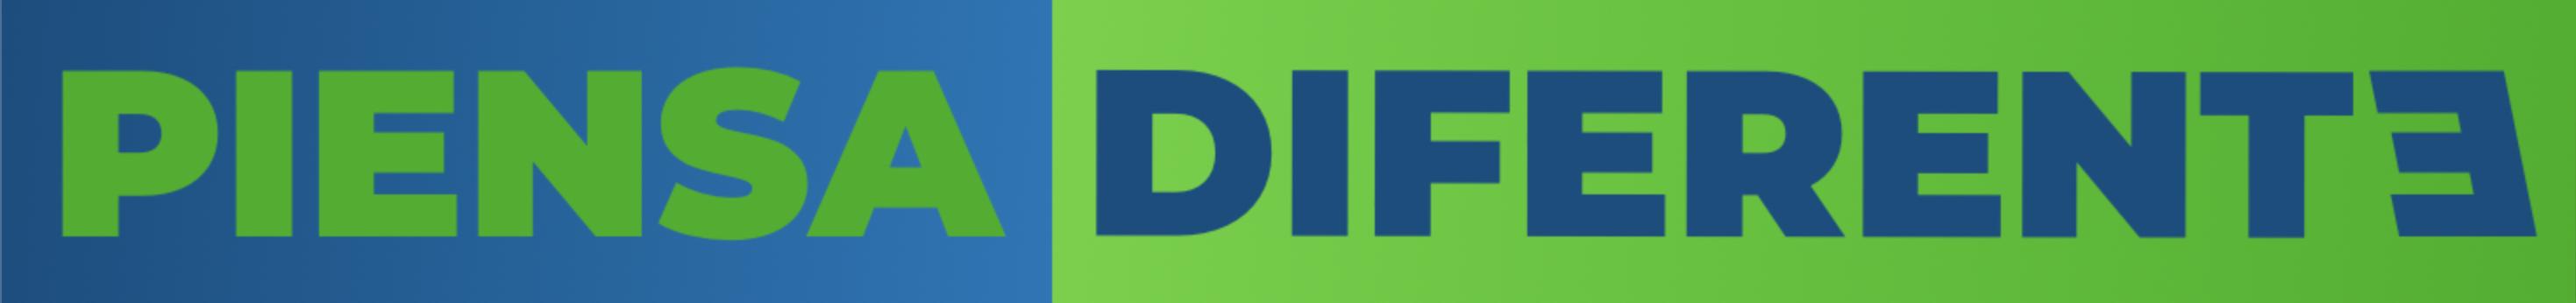 Logo Piensa Diferente